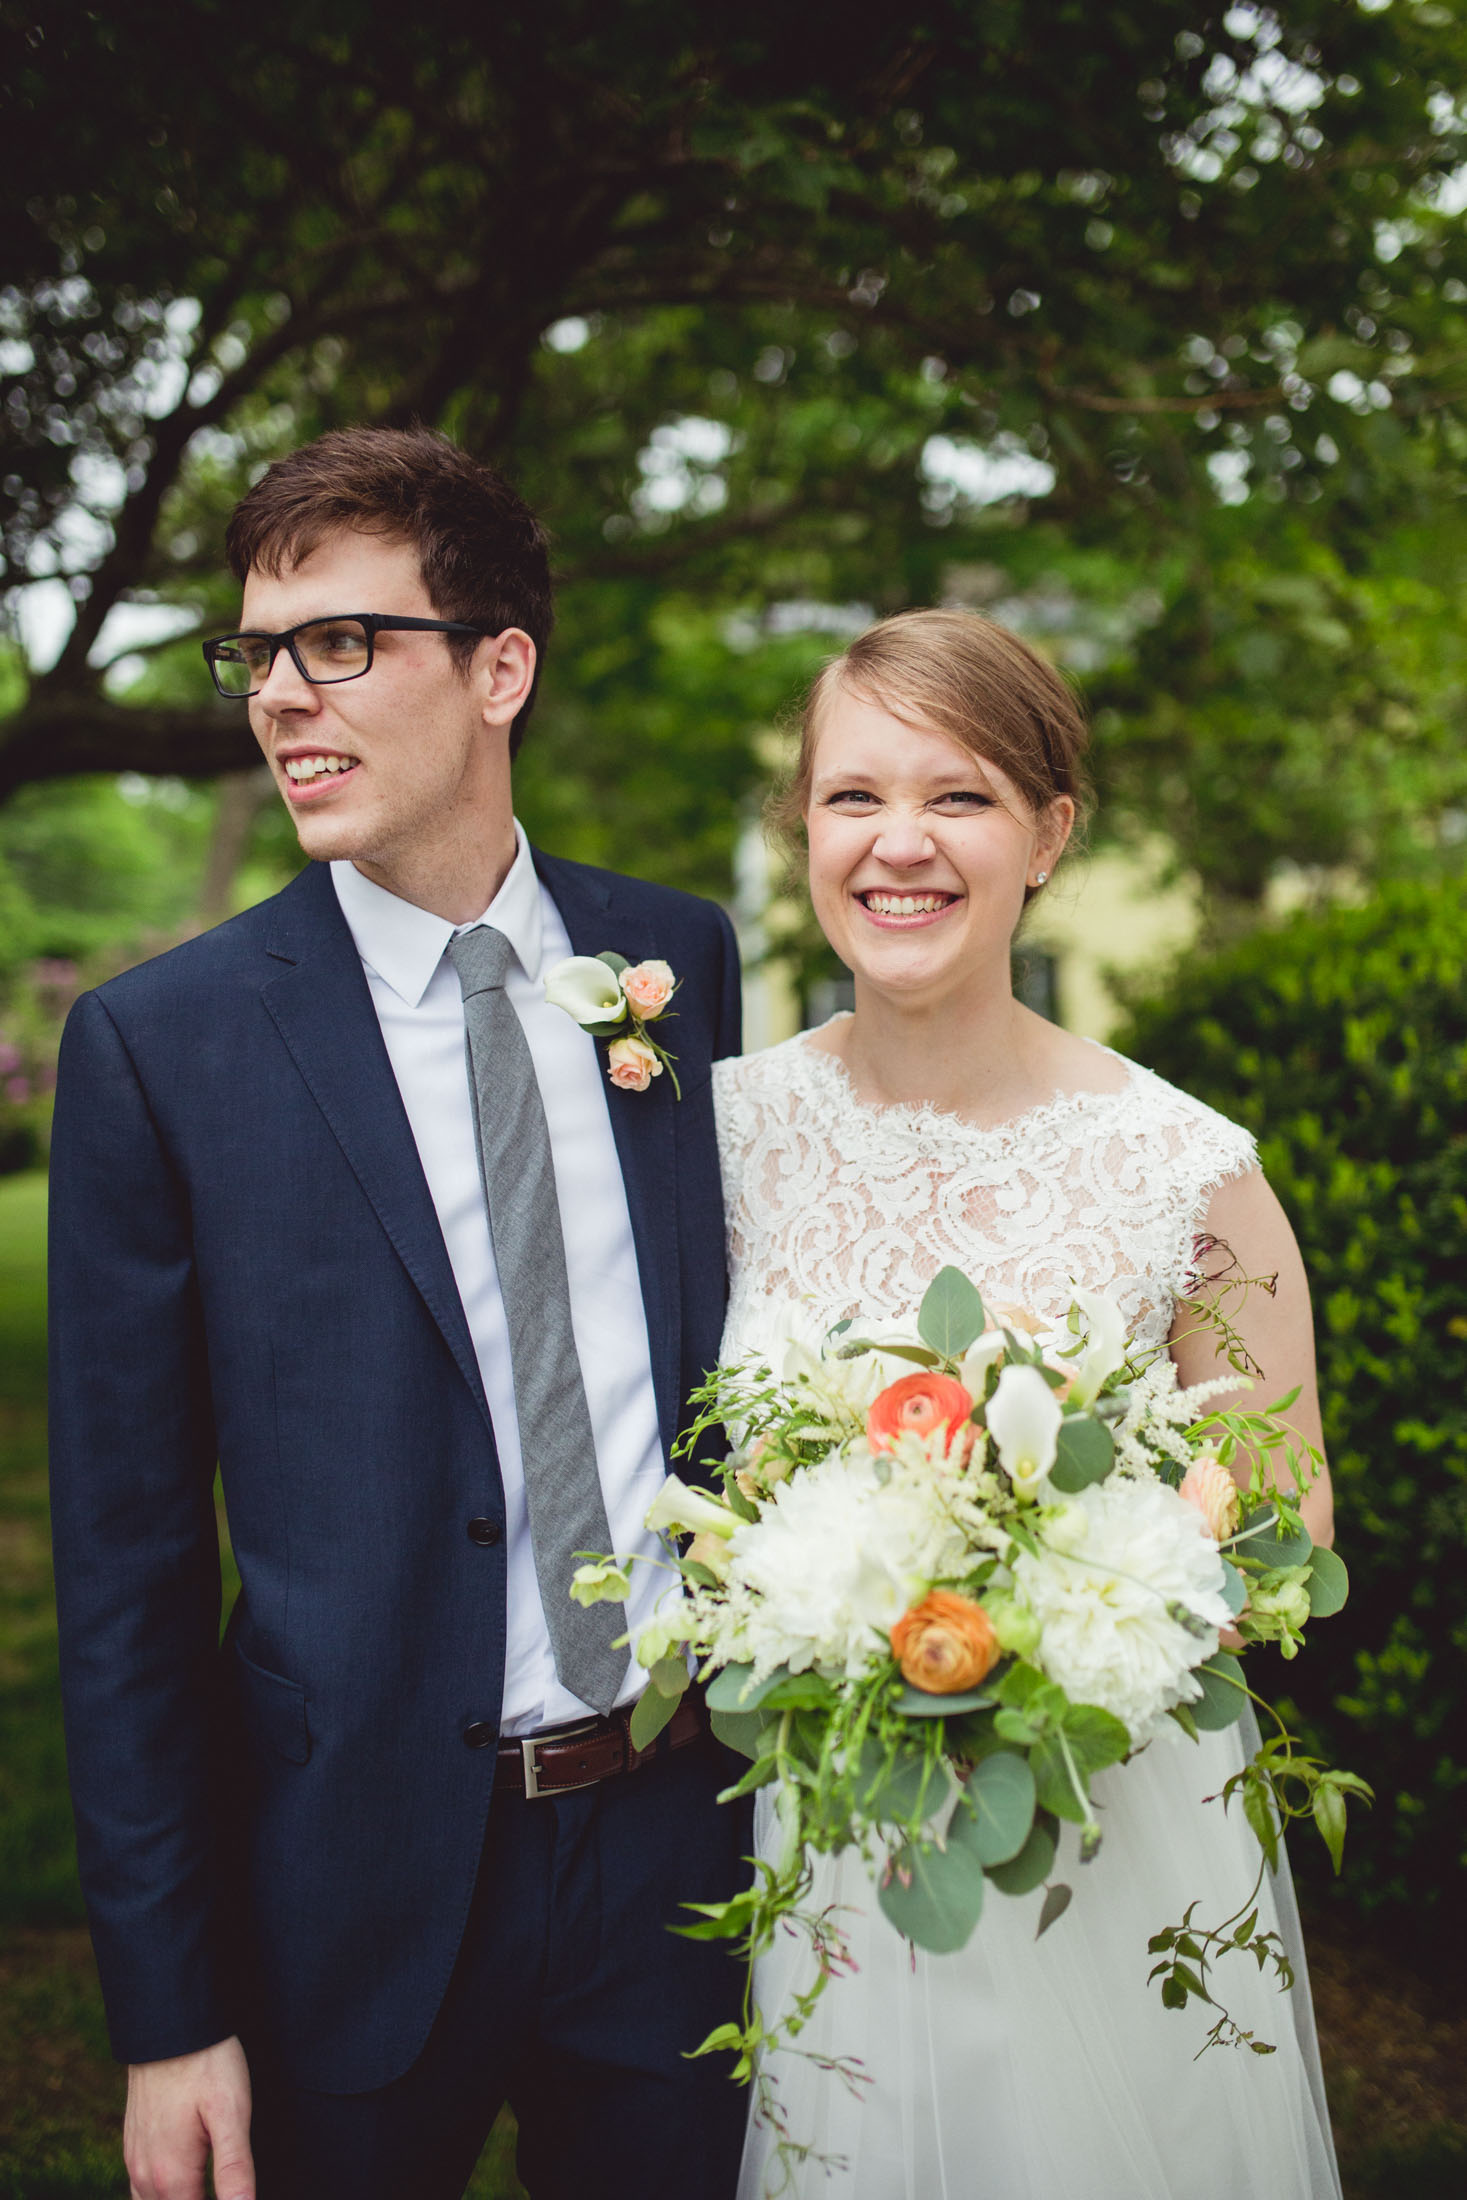 Elks-Wedding-Gloucester-21.jpg